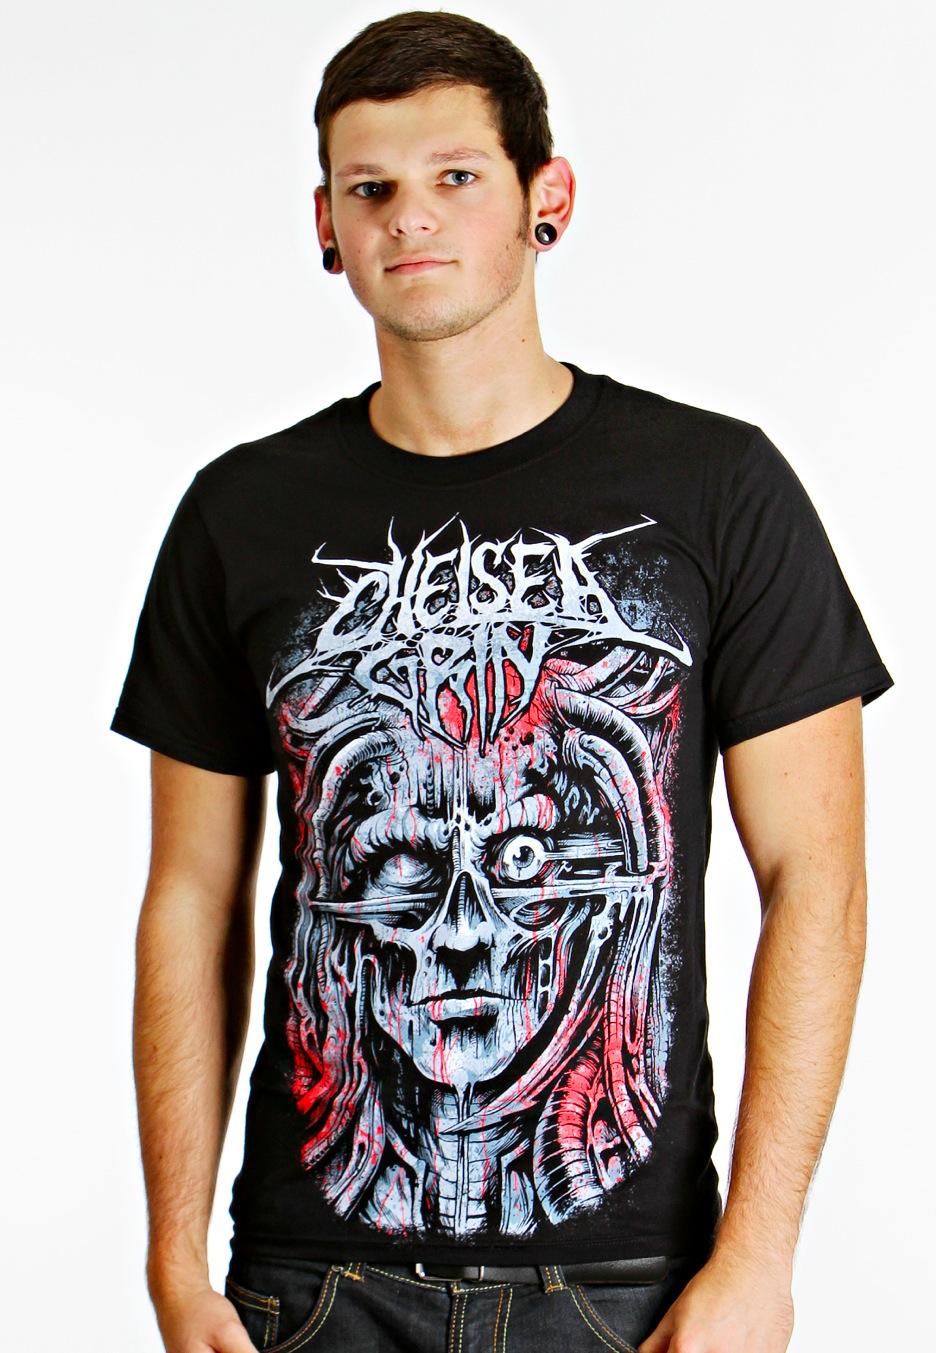 chelsea grin biomechanical t shirt official deathcore merchandise shop uk. Black Bedroom Furniture Sets. Home Design Ideas